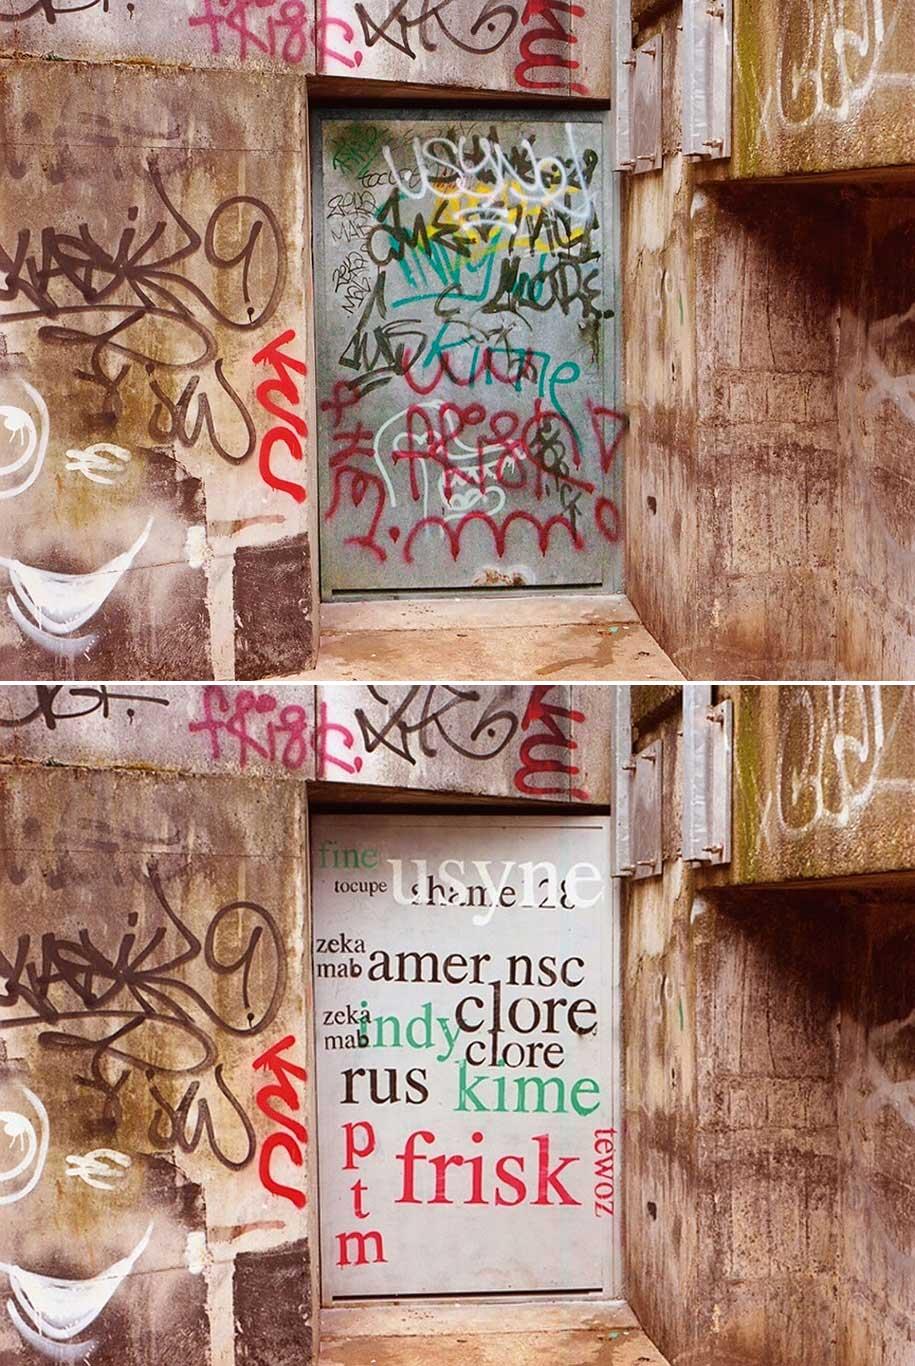 Mathieu Tremblin macht Graffiti-Tags leserlich Mathieu-Tremblin-tag-clouds-graffiti_06